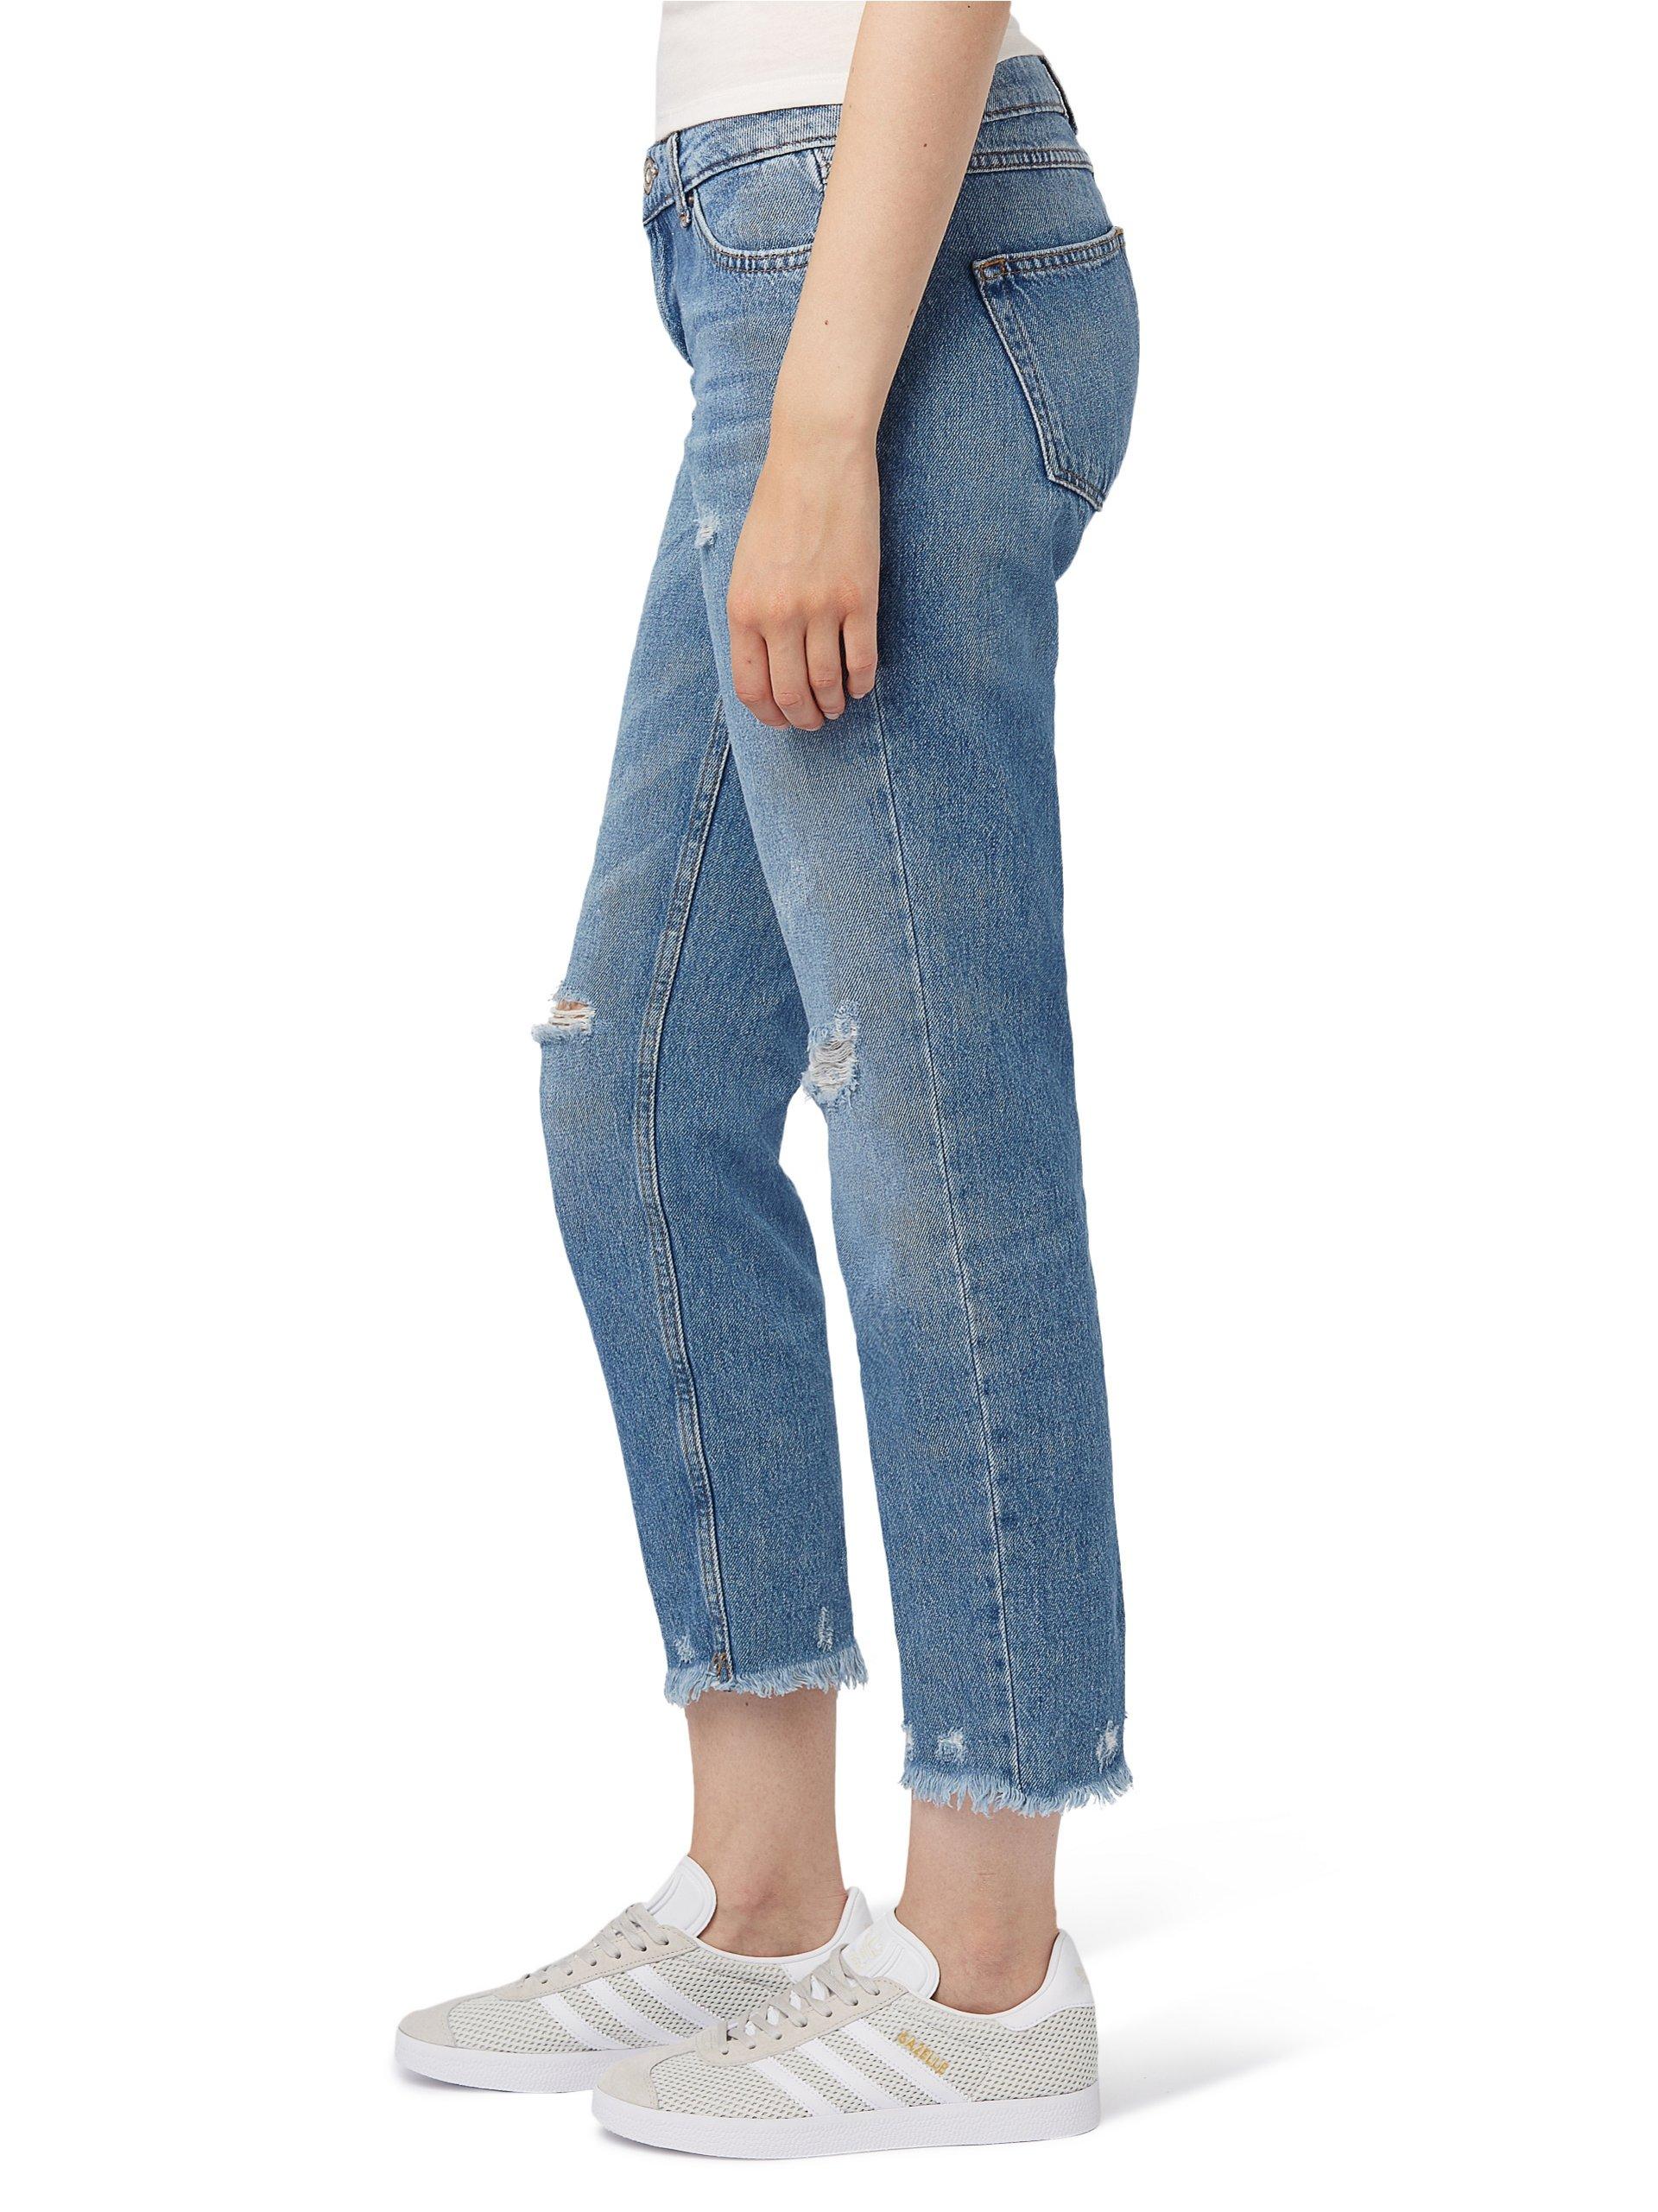 review damen jeans susi slim 2 online kaufen peek und cloppenburg de. Black Bedroom Furniture Sets. Home Design Ideas